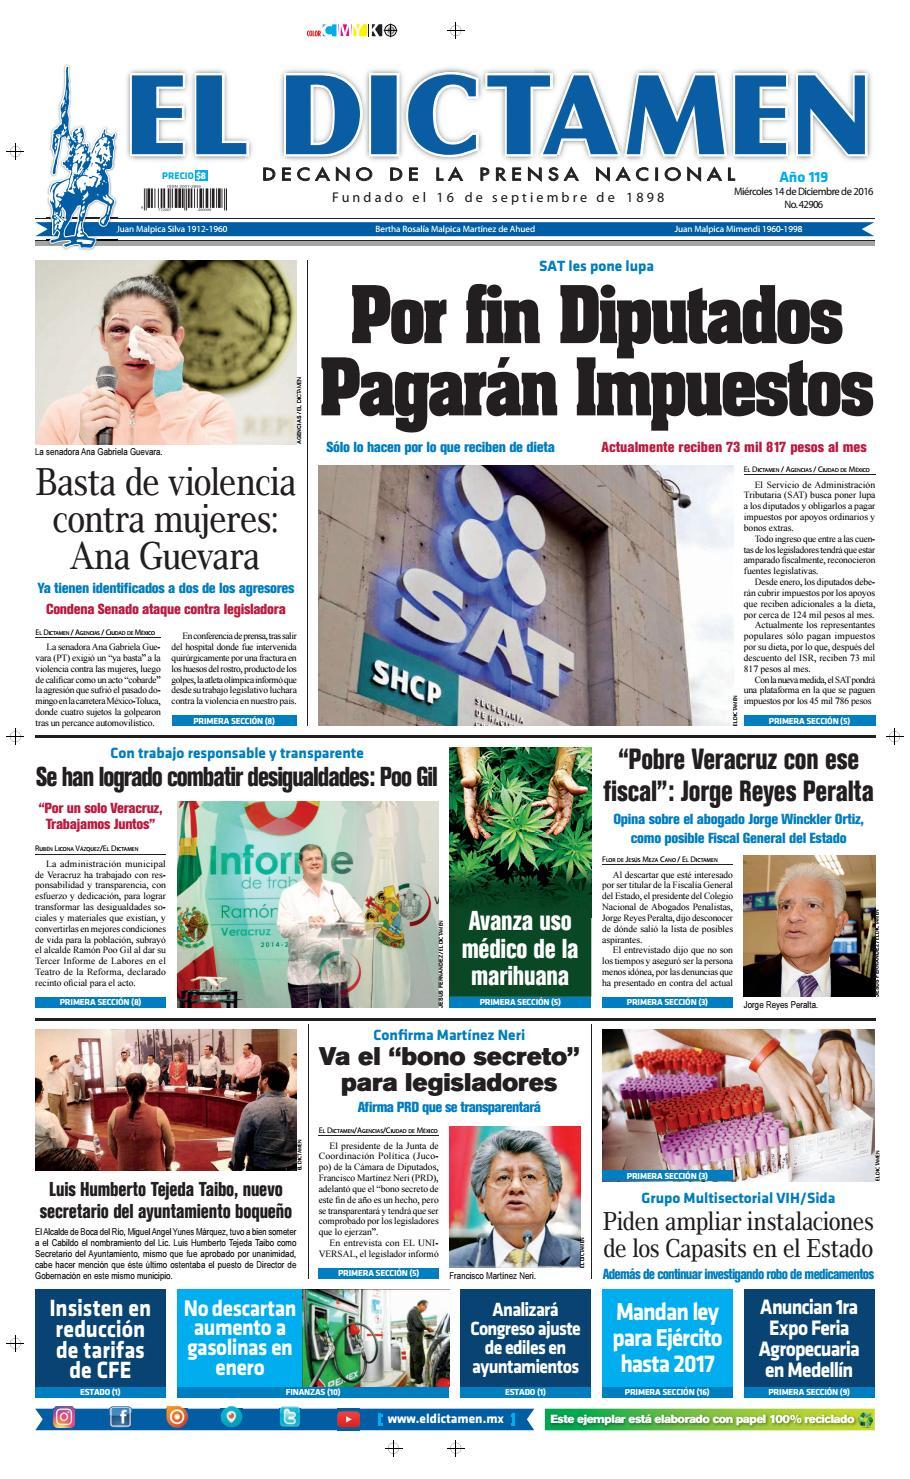 El Dictamen 14 de Diciembre 2016 by El Dictamen - issuu 1b7bebddd6c